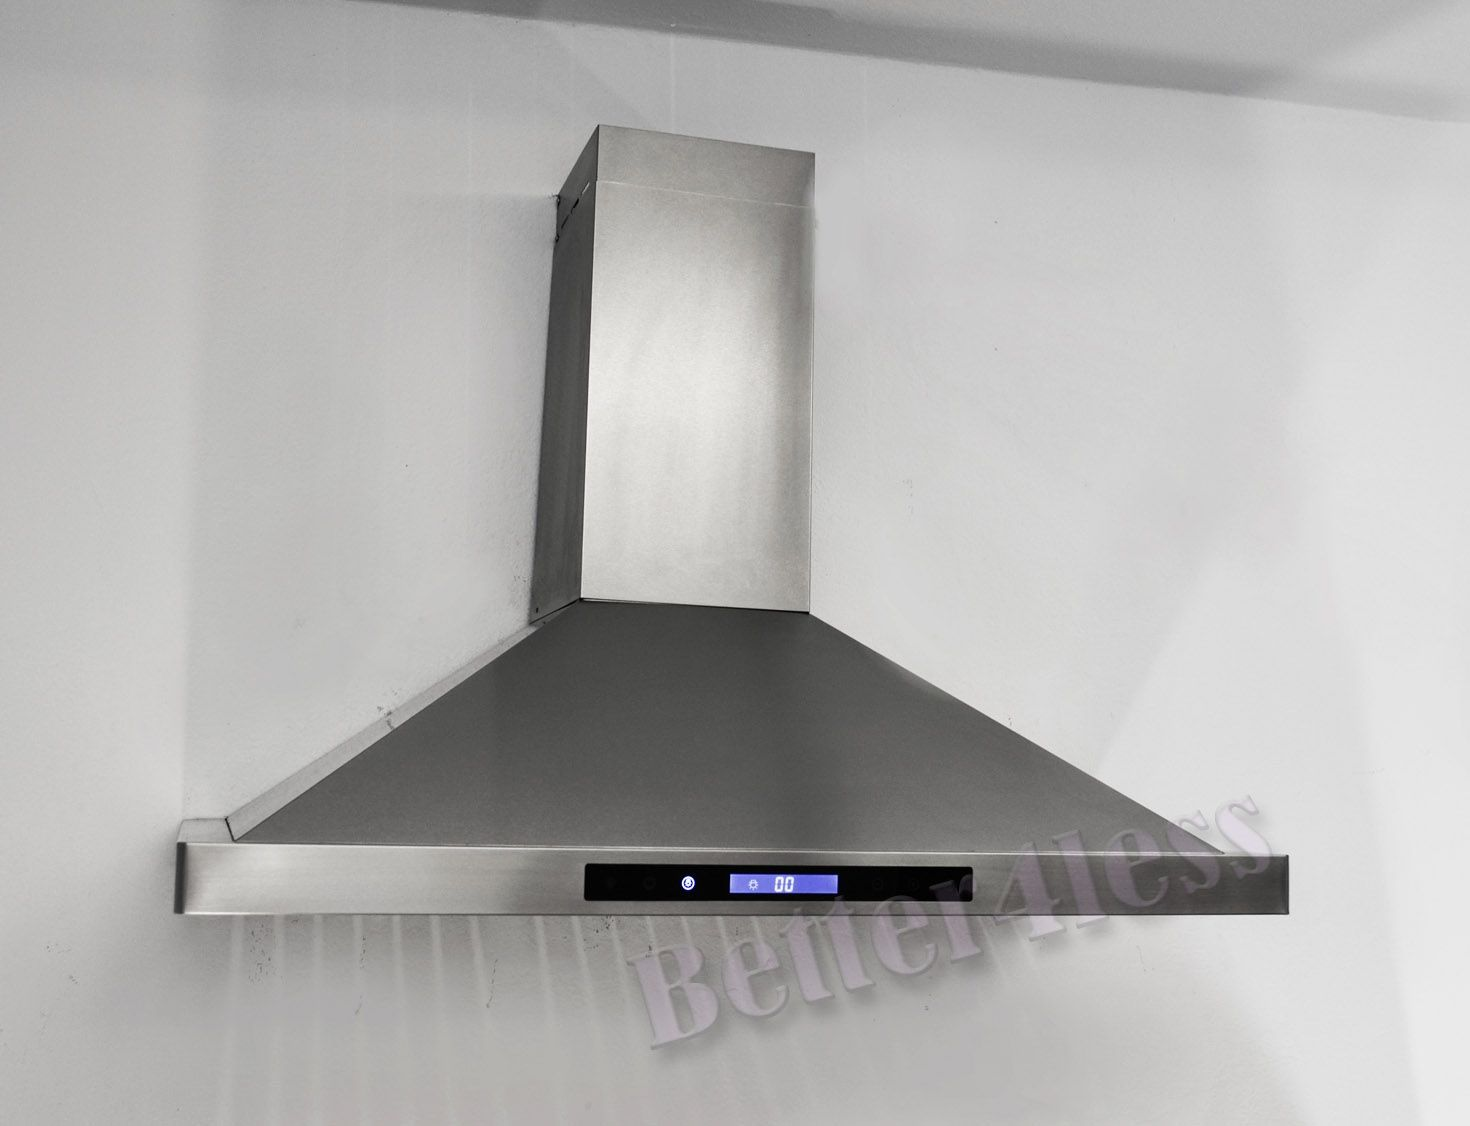 Exhaust Fan For Kitchen | http://urresults.us/ | Pinterest